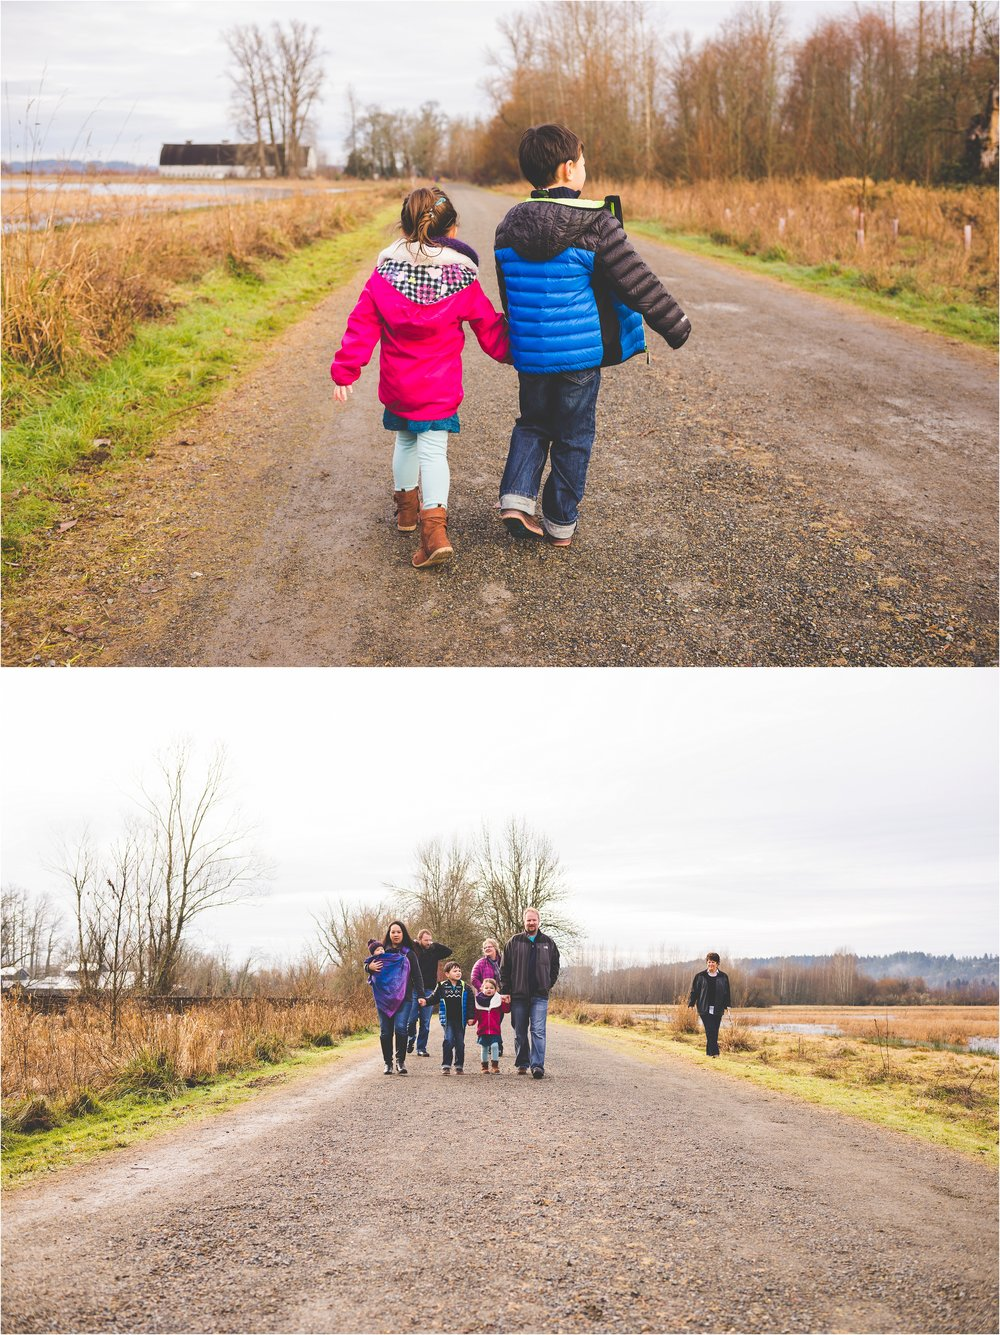 nisqually-wildlife-refuge-family-session-jannicka-mayte-olympia-wa-family-photographer_0009.jpg